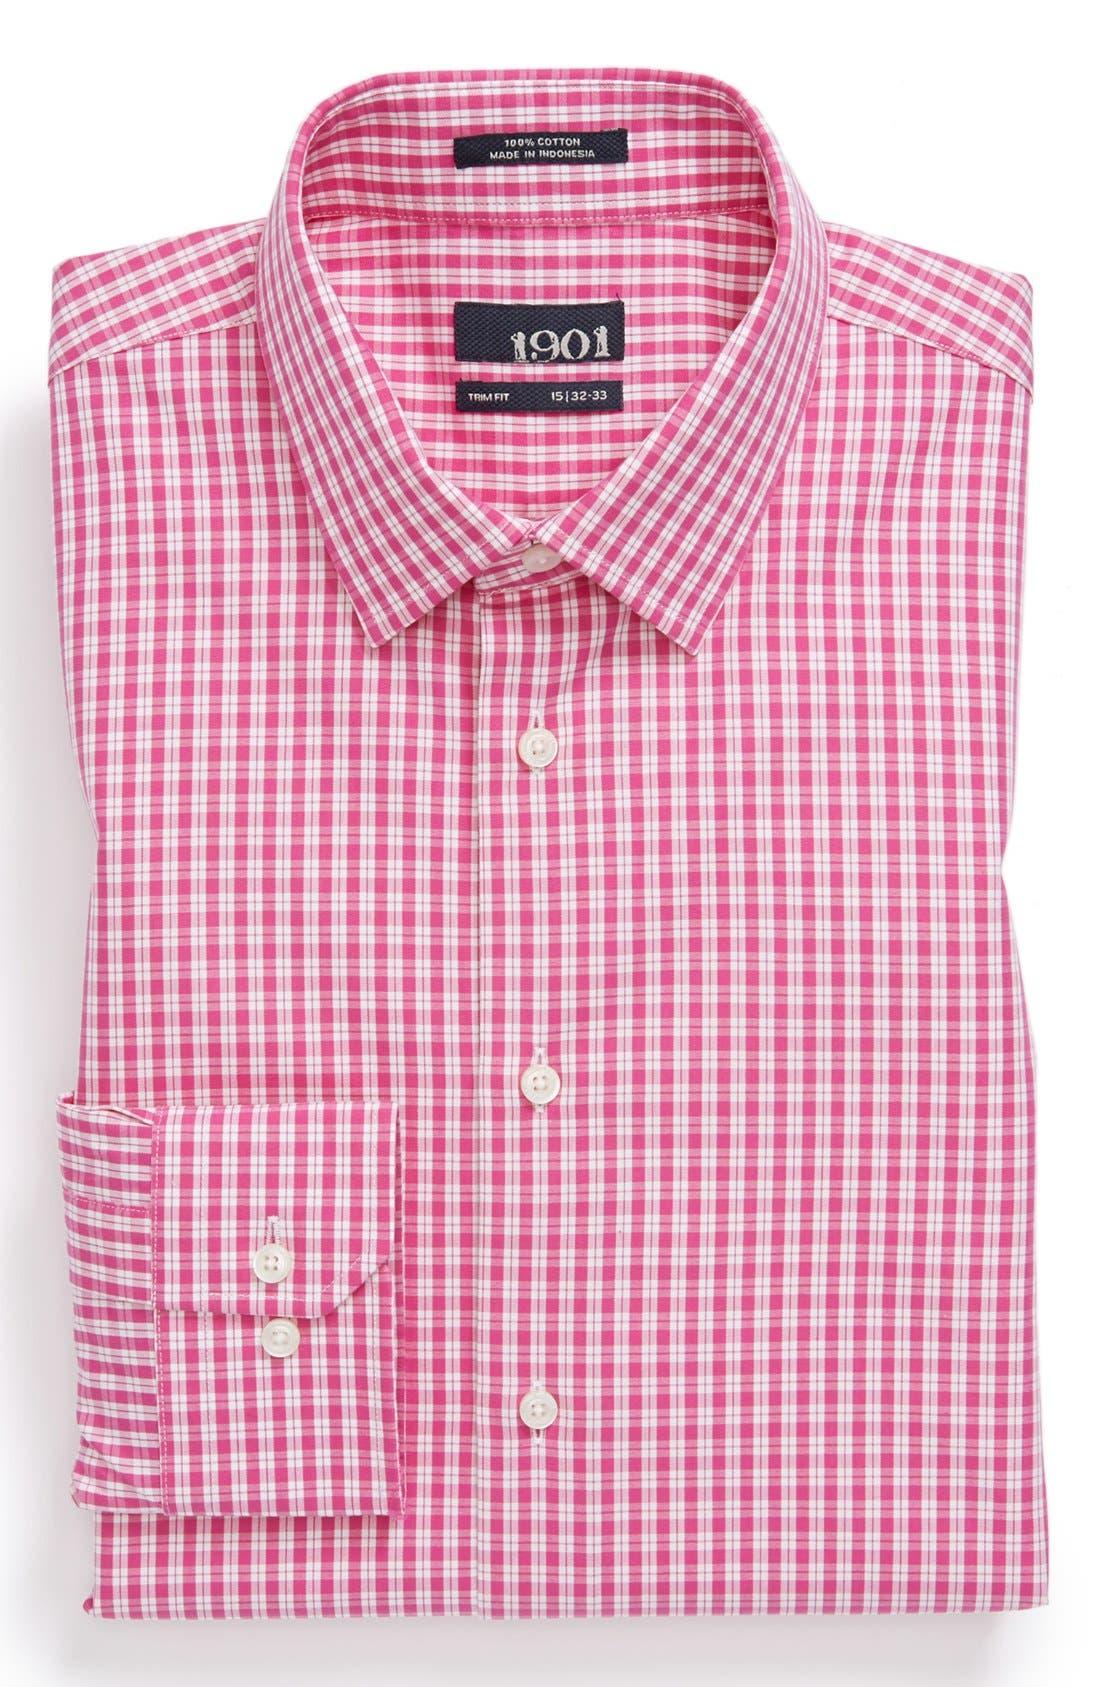 Alternate Image 1 Selected - 1901 Trim Fit Check Dress Shirt